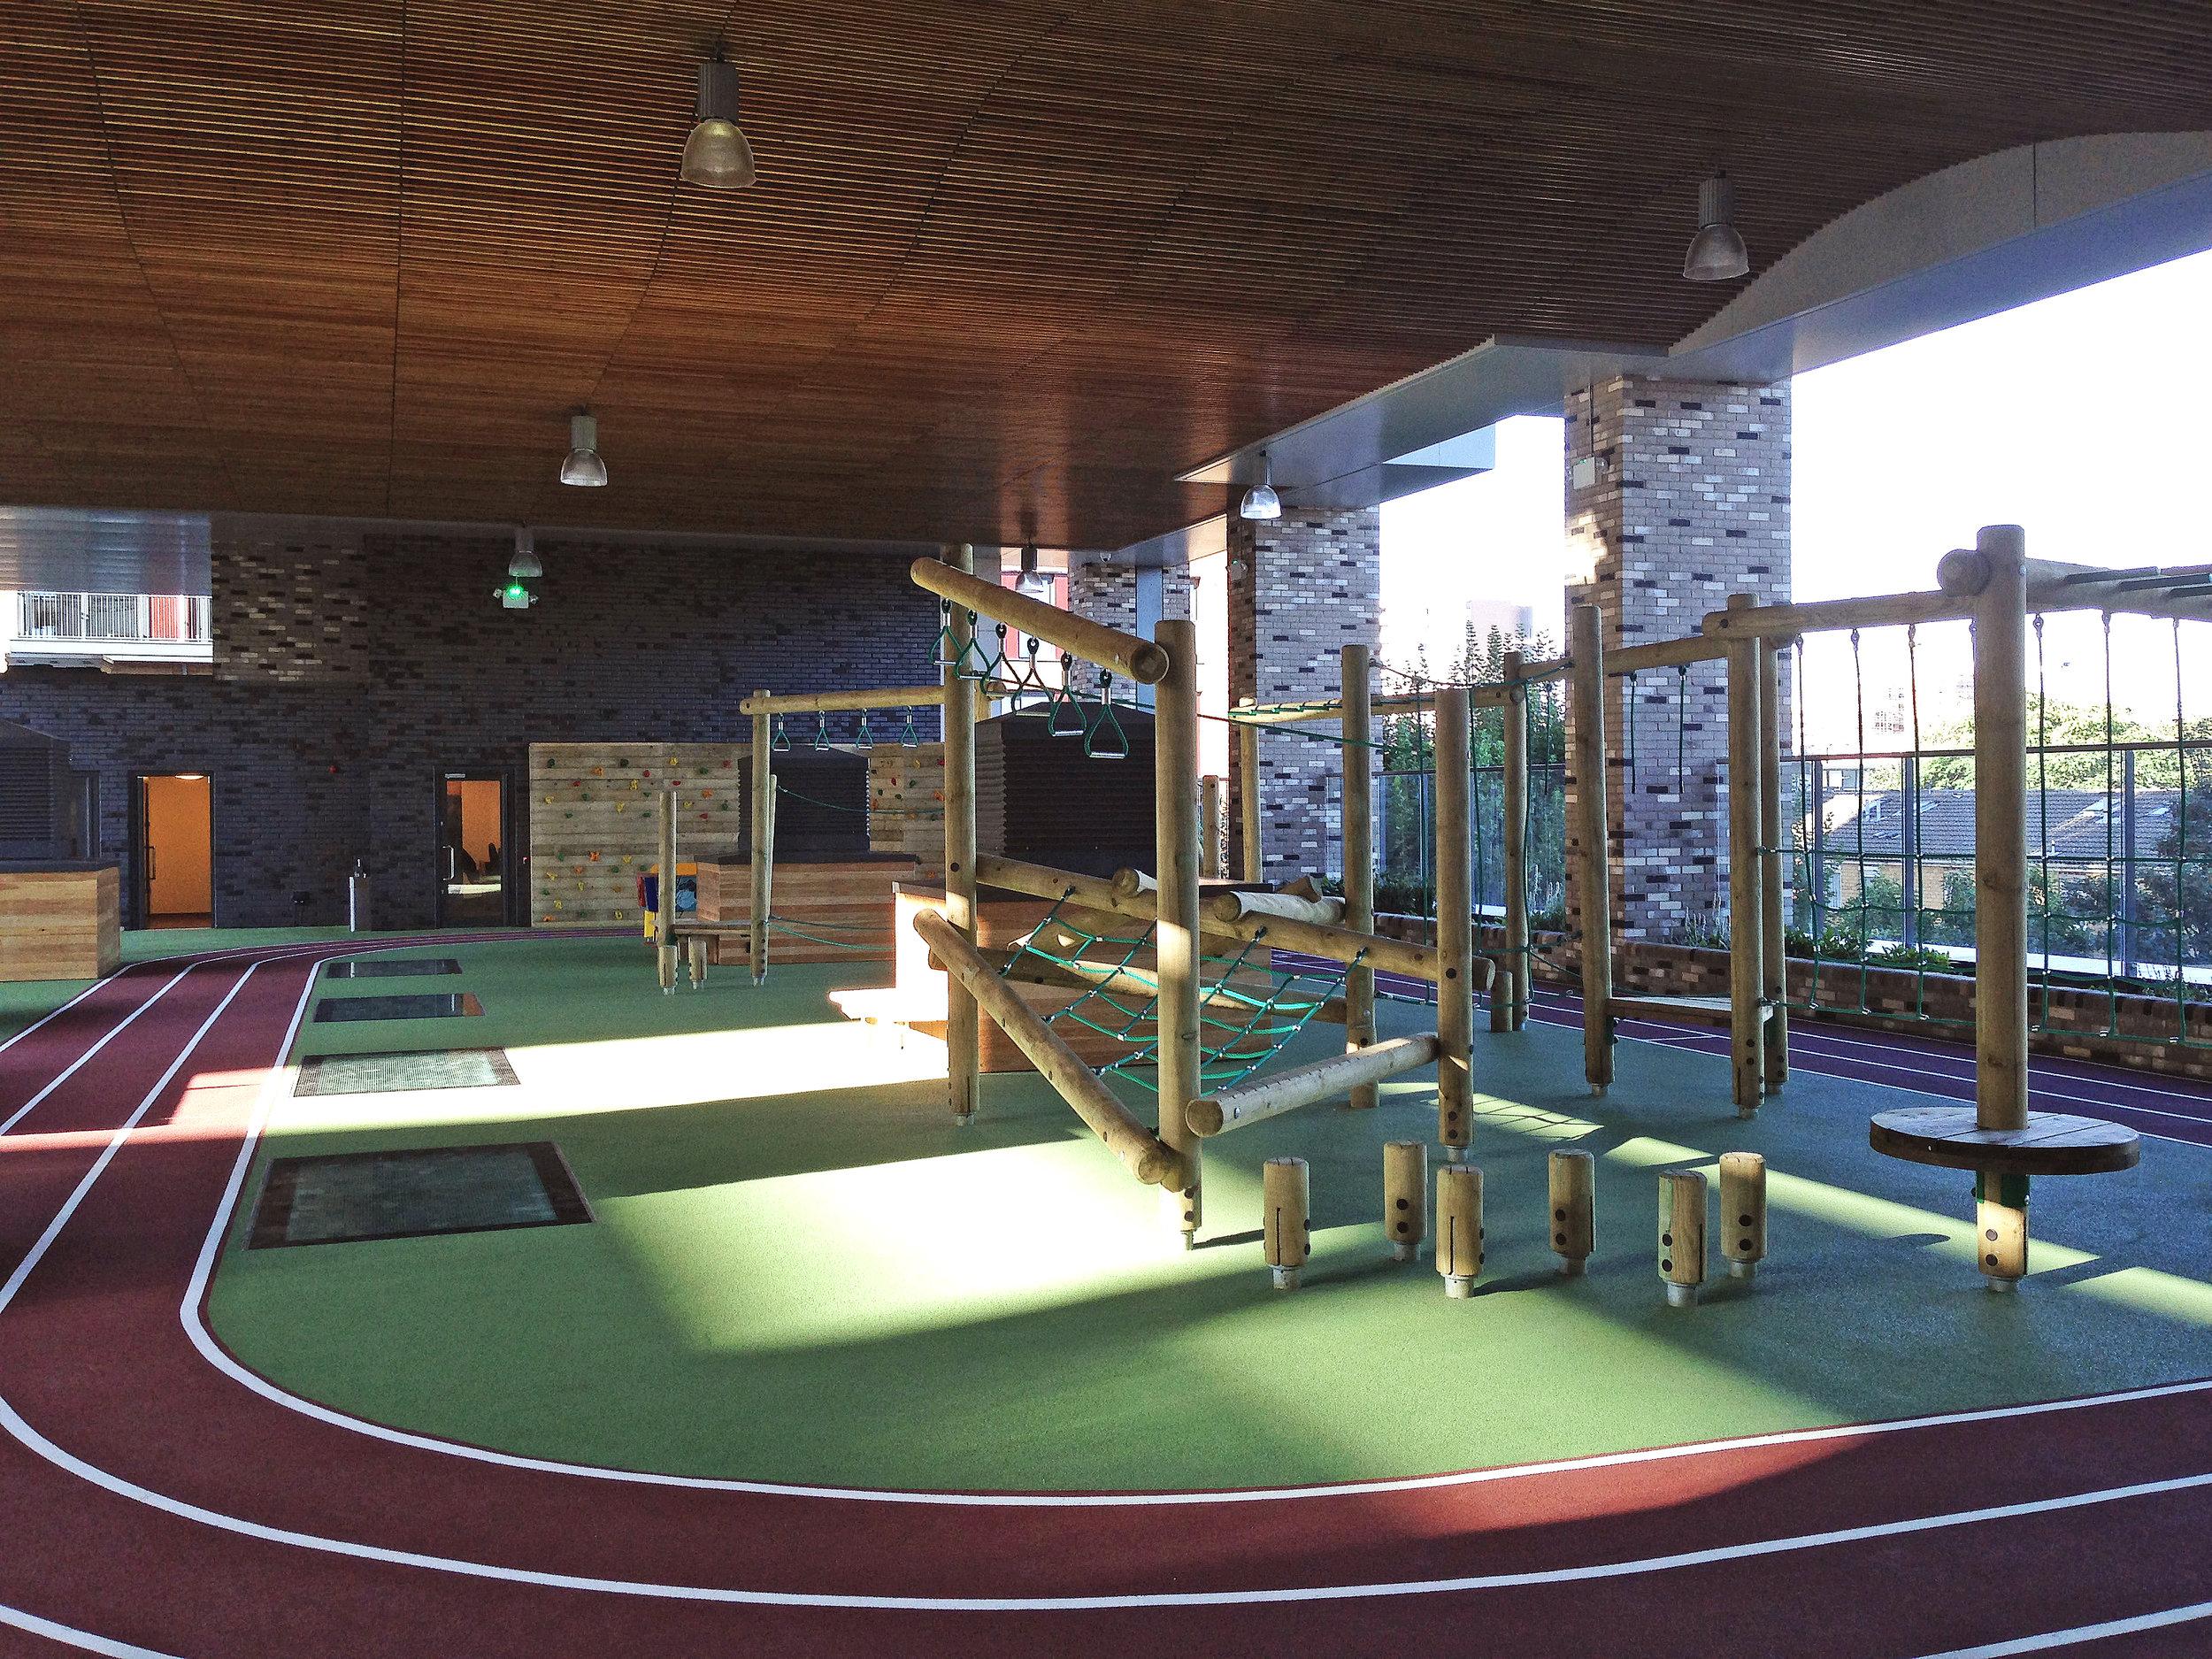 (JF) Second floor / deck level playground